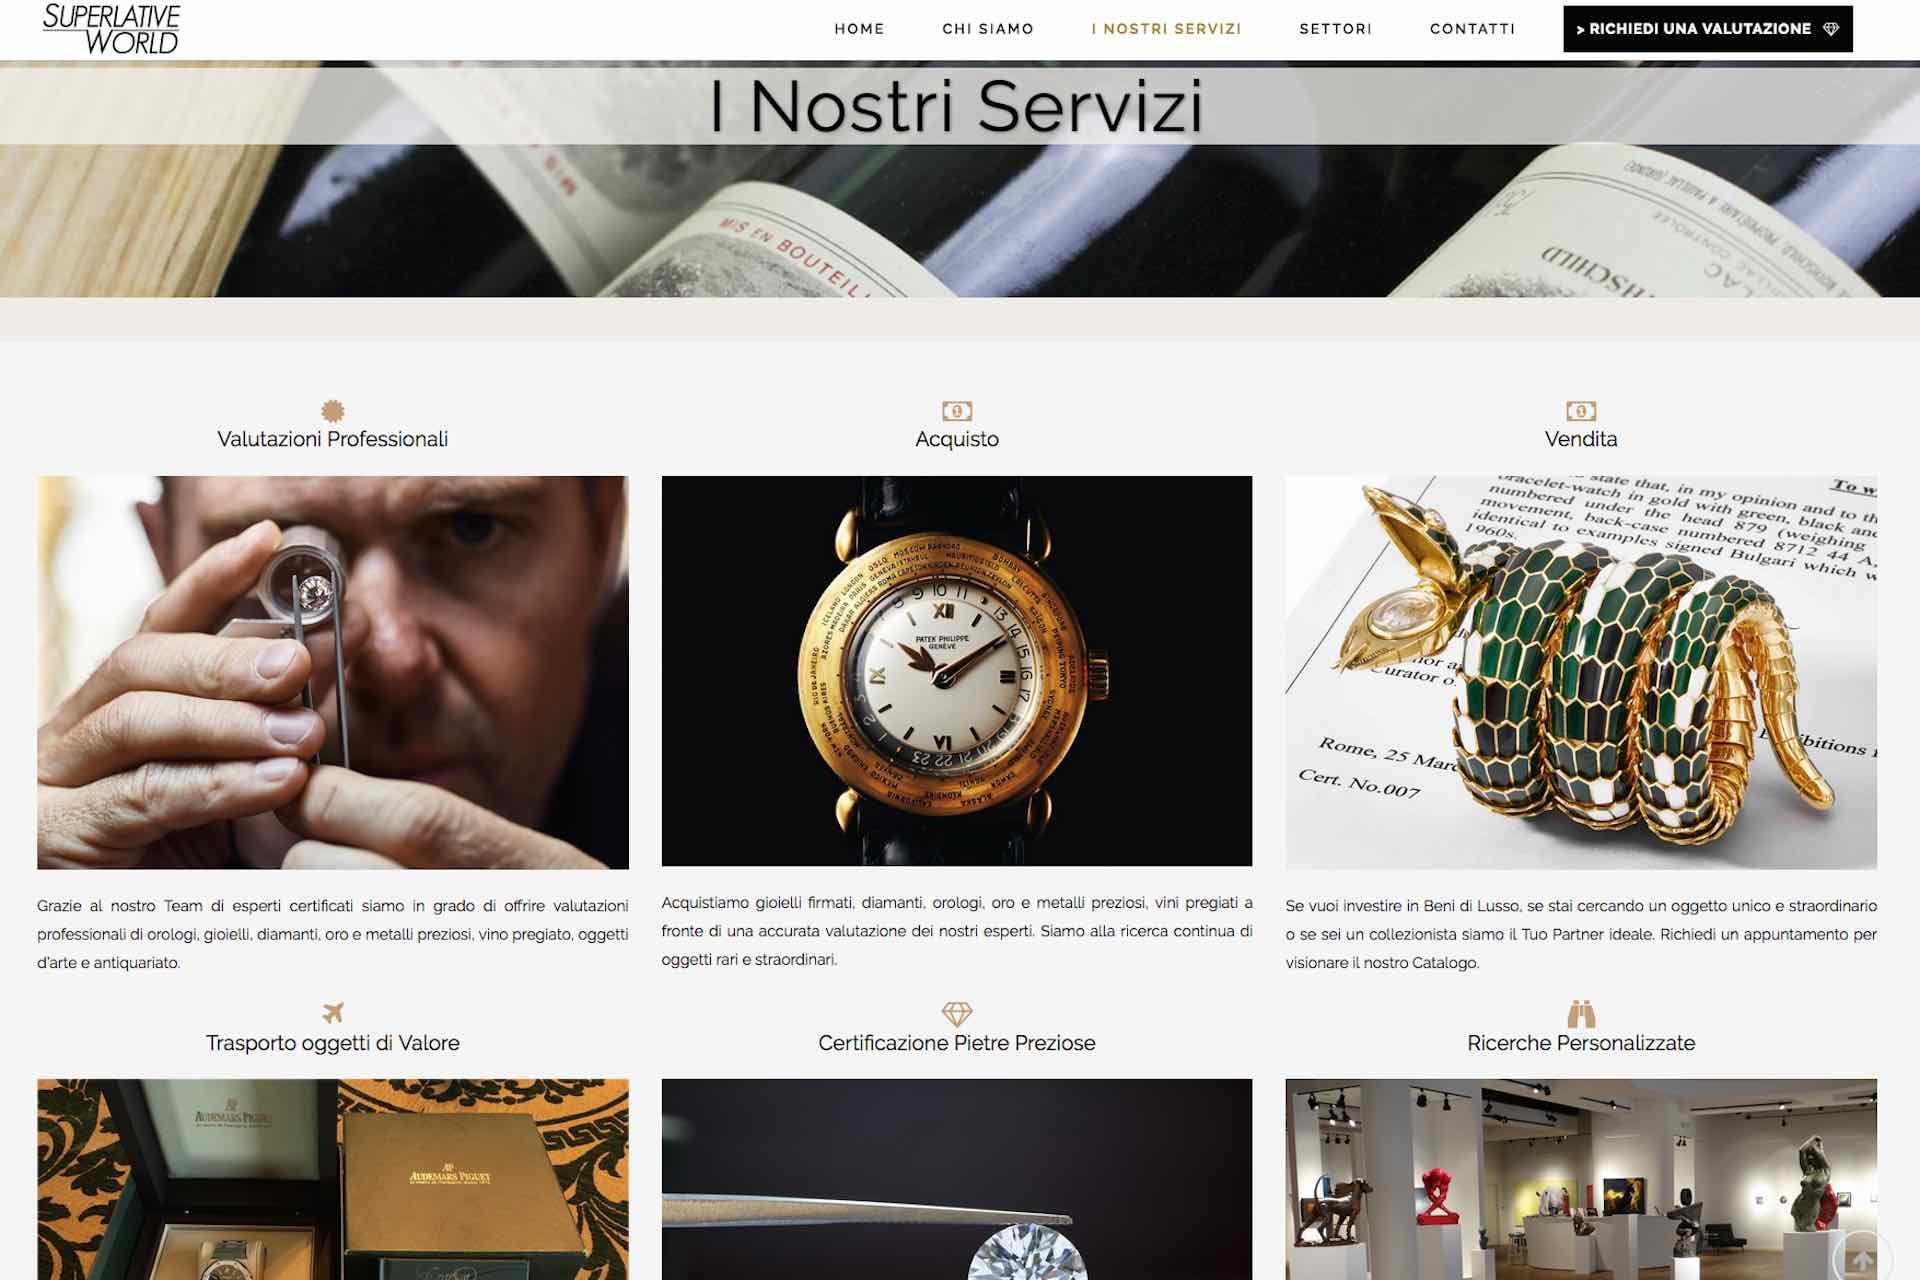 superlative-sito-web-megeek